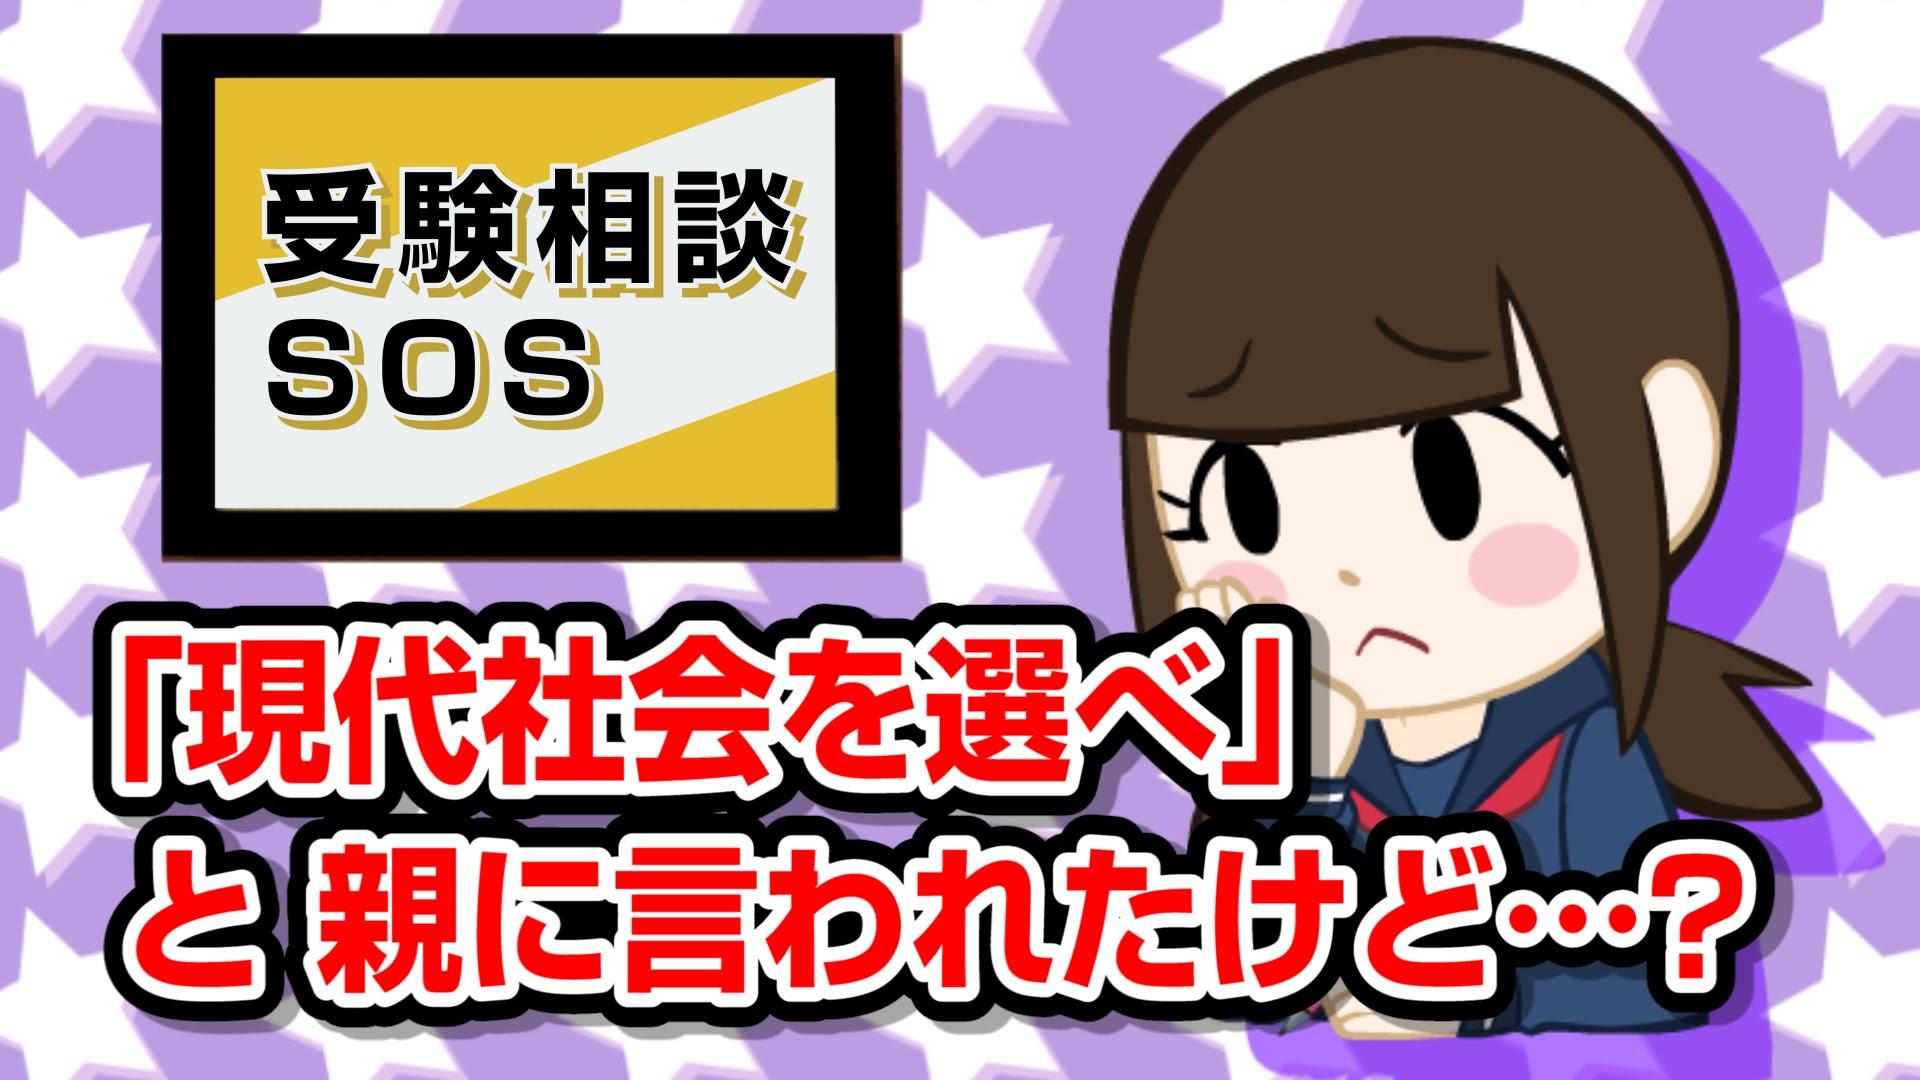 【vol.525】「簡単だから現代社会を選べ」と親に言われた!! 日本史・世界史とそんなに難易度は違う? 受験相談SOS